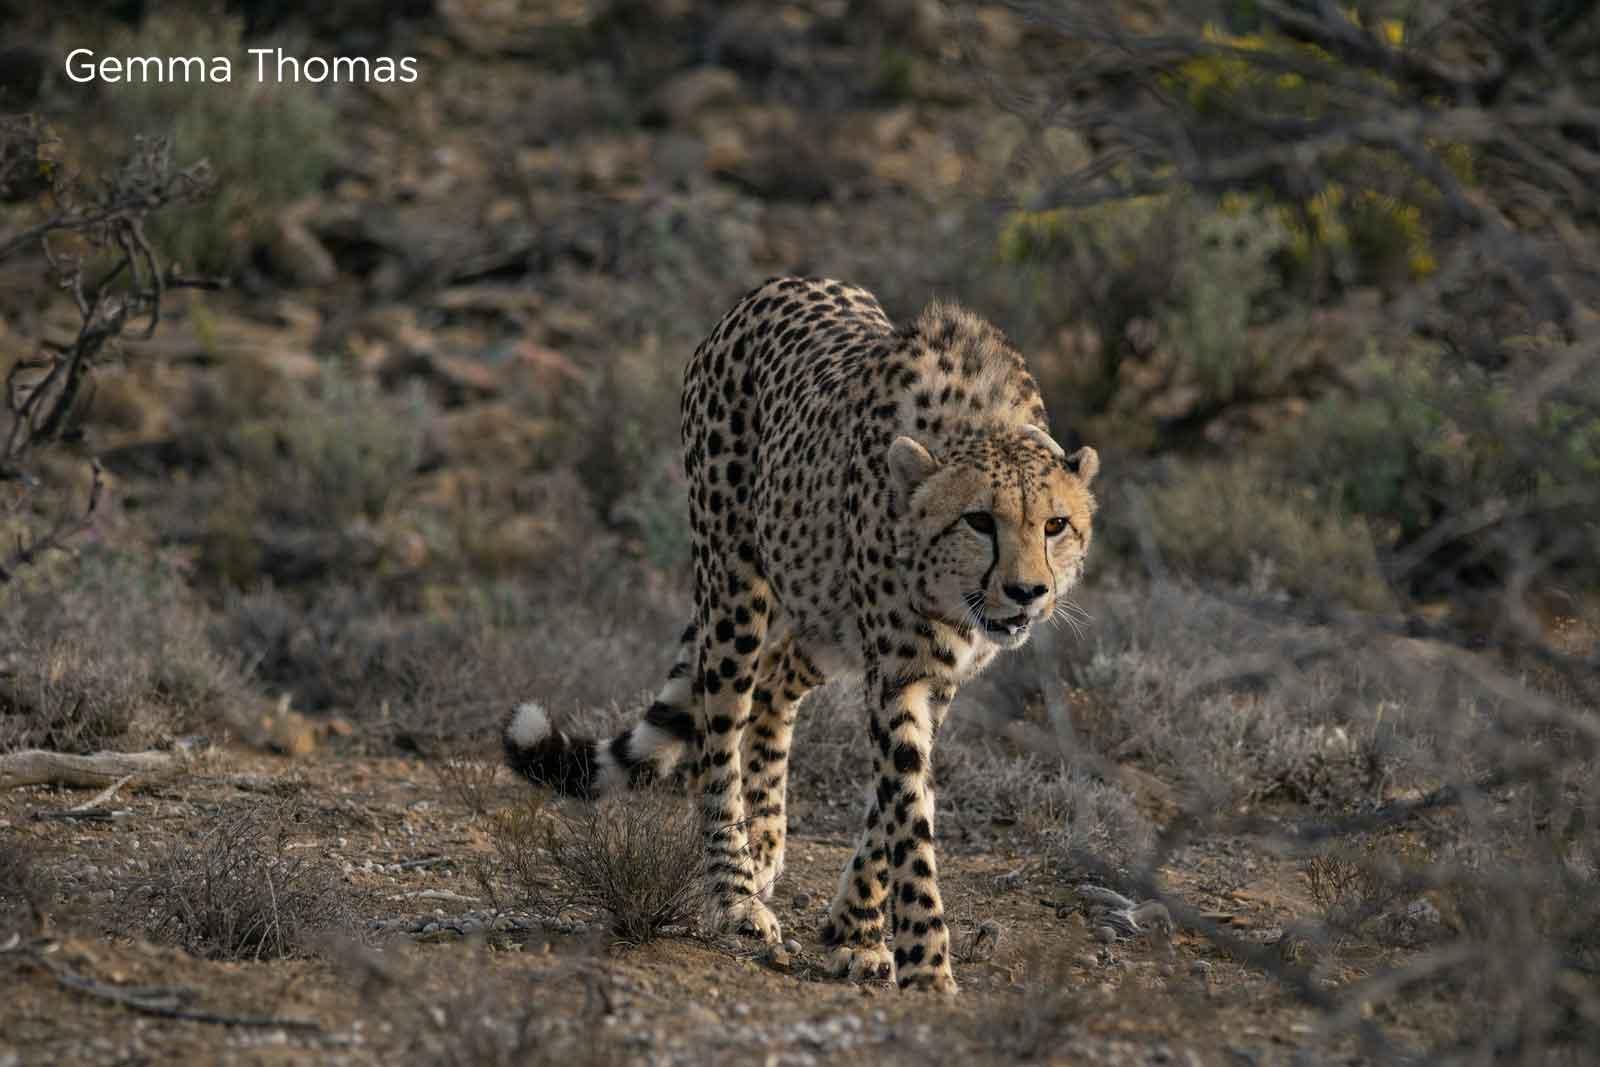 A Conscious Safari Experience at Roam Private Game Reserve